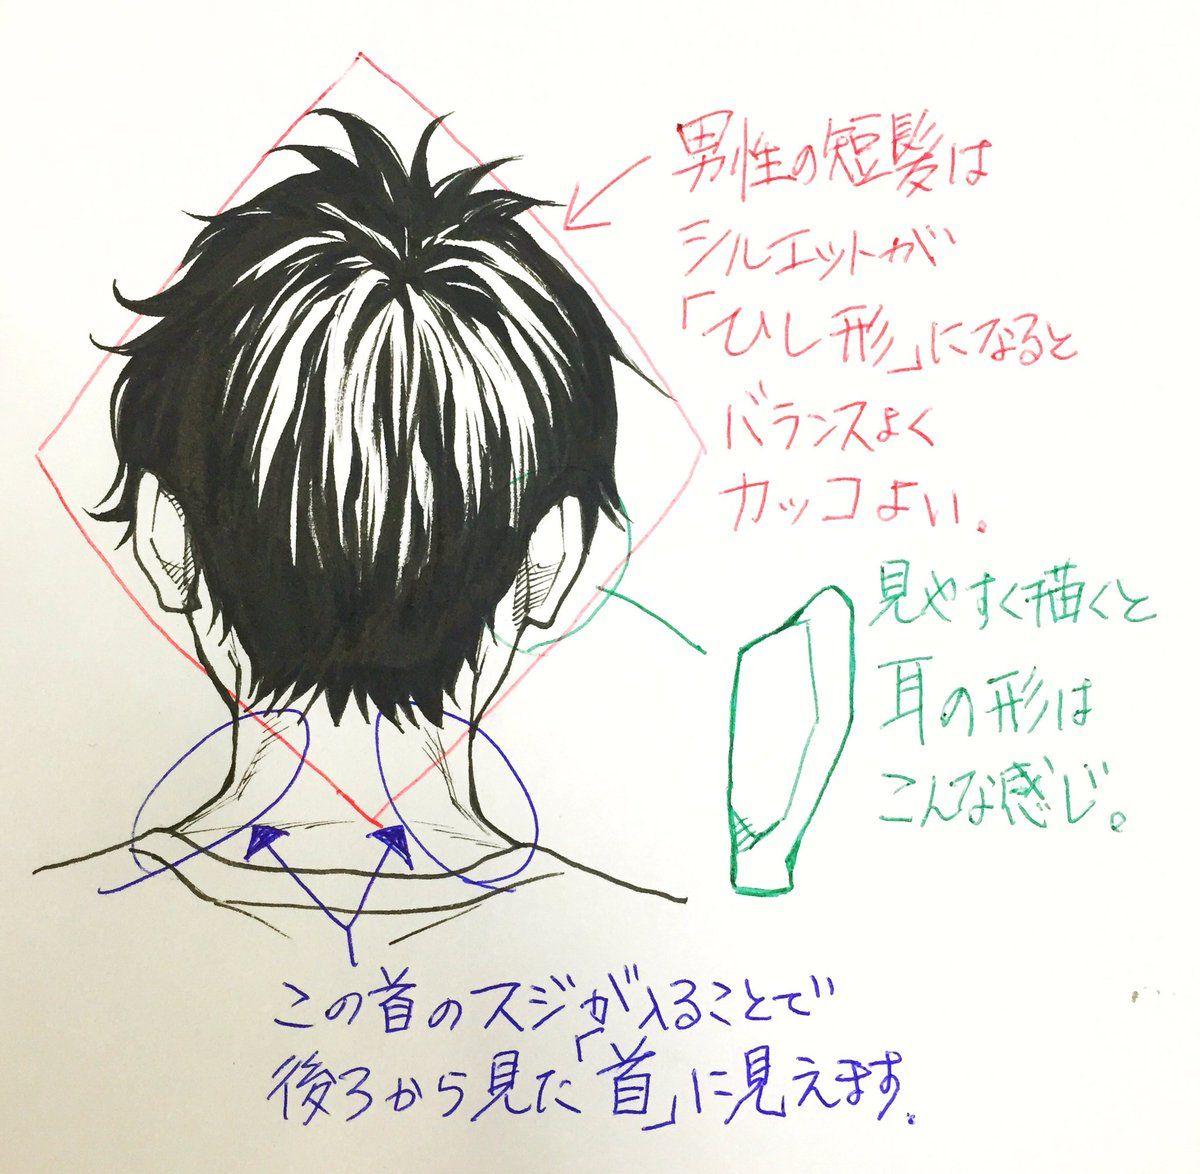 24 Twitter 画像あり 吉村拓也 顔 描き方 イラスト